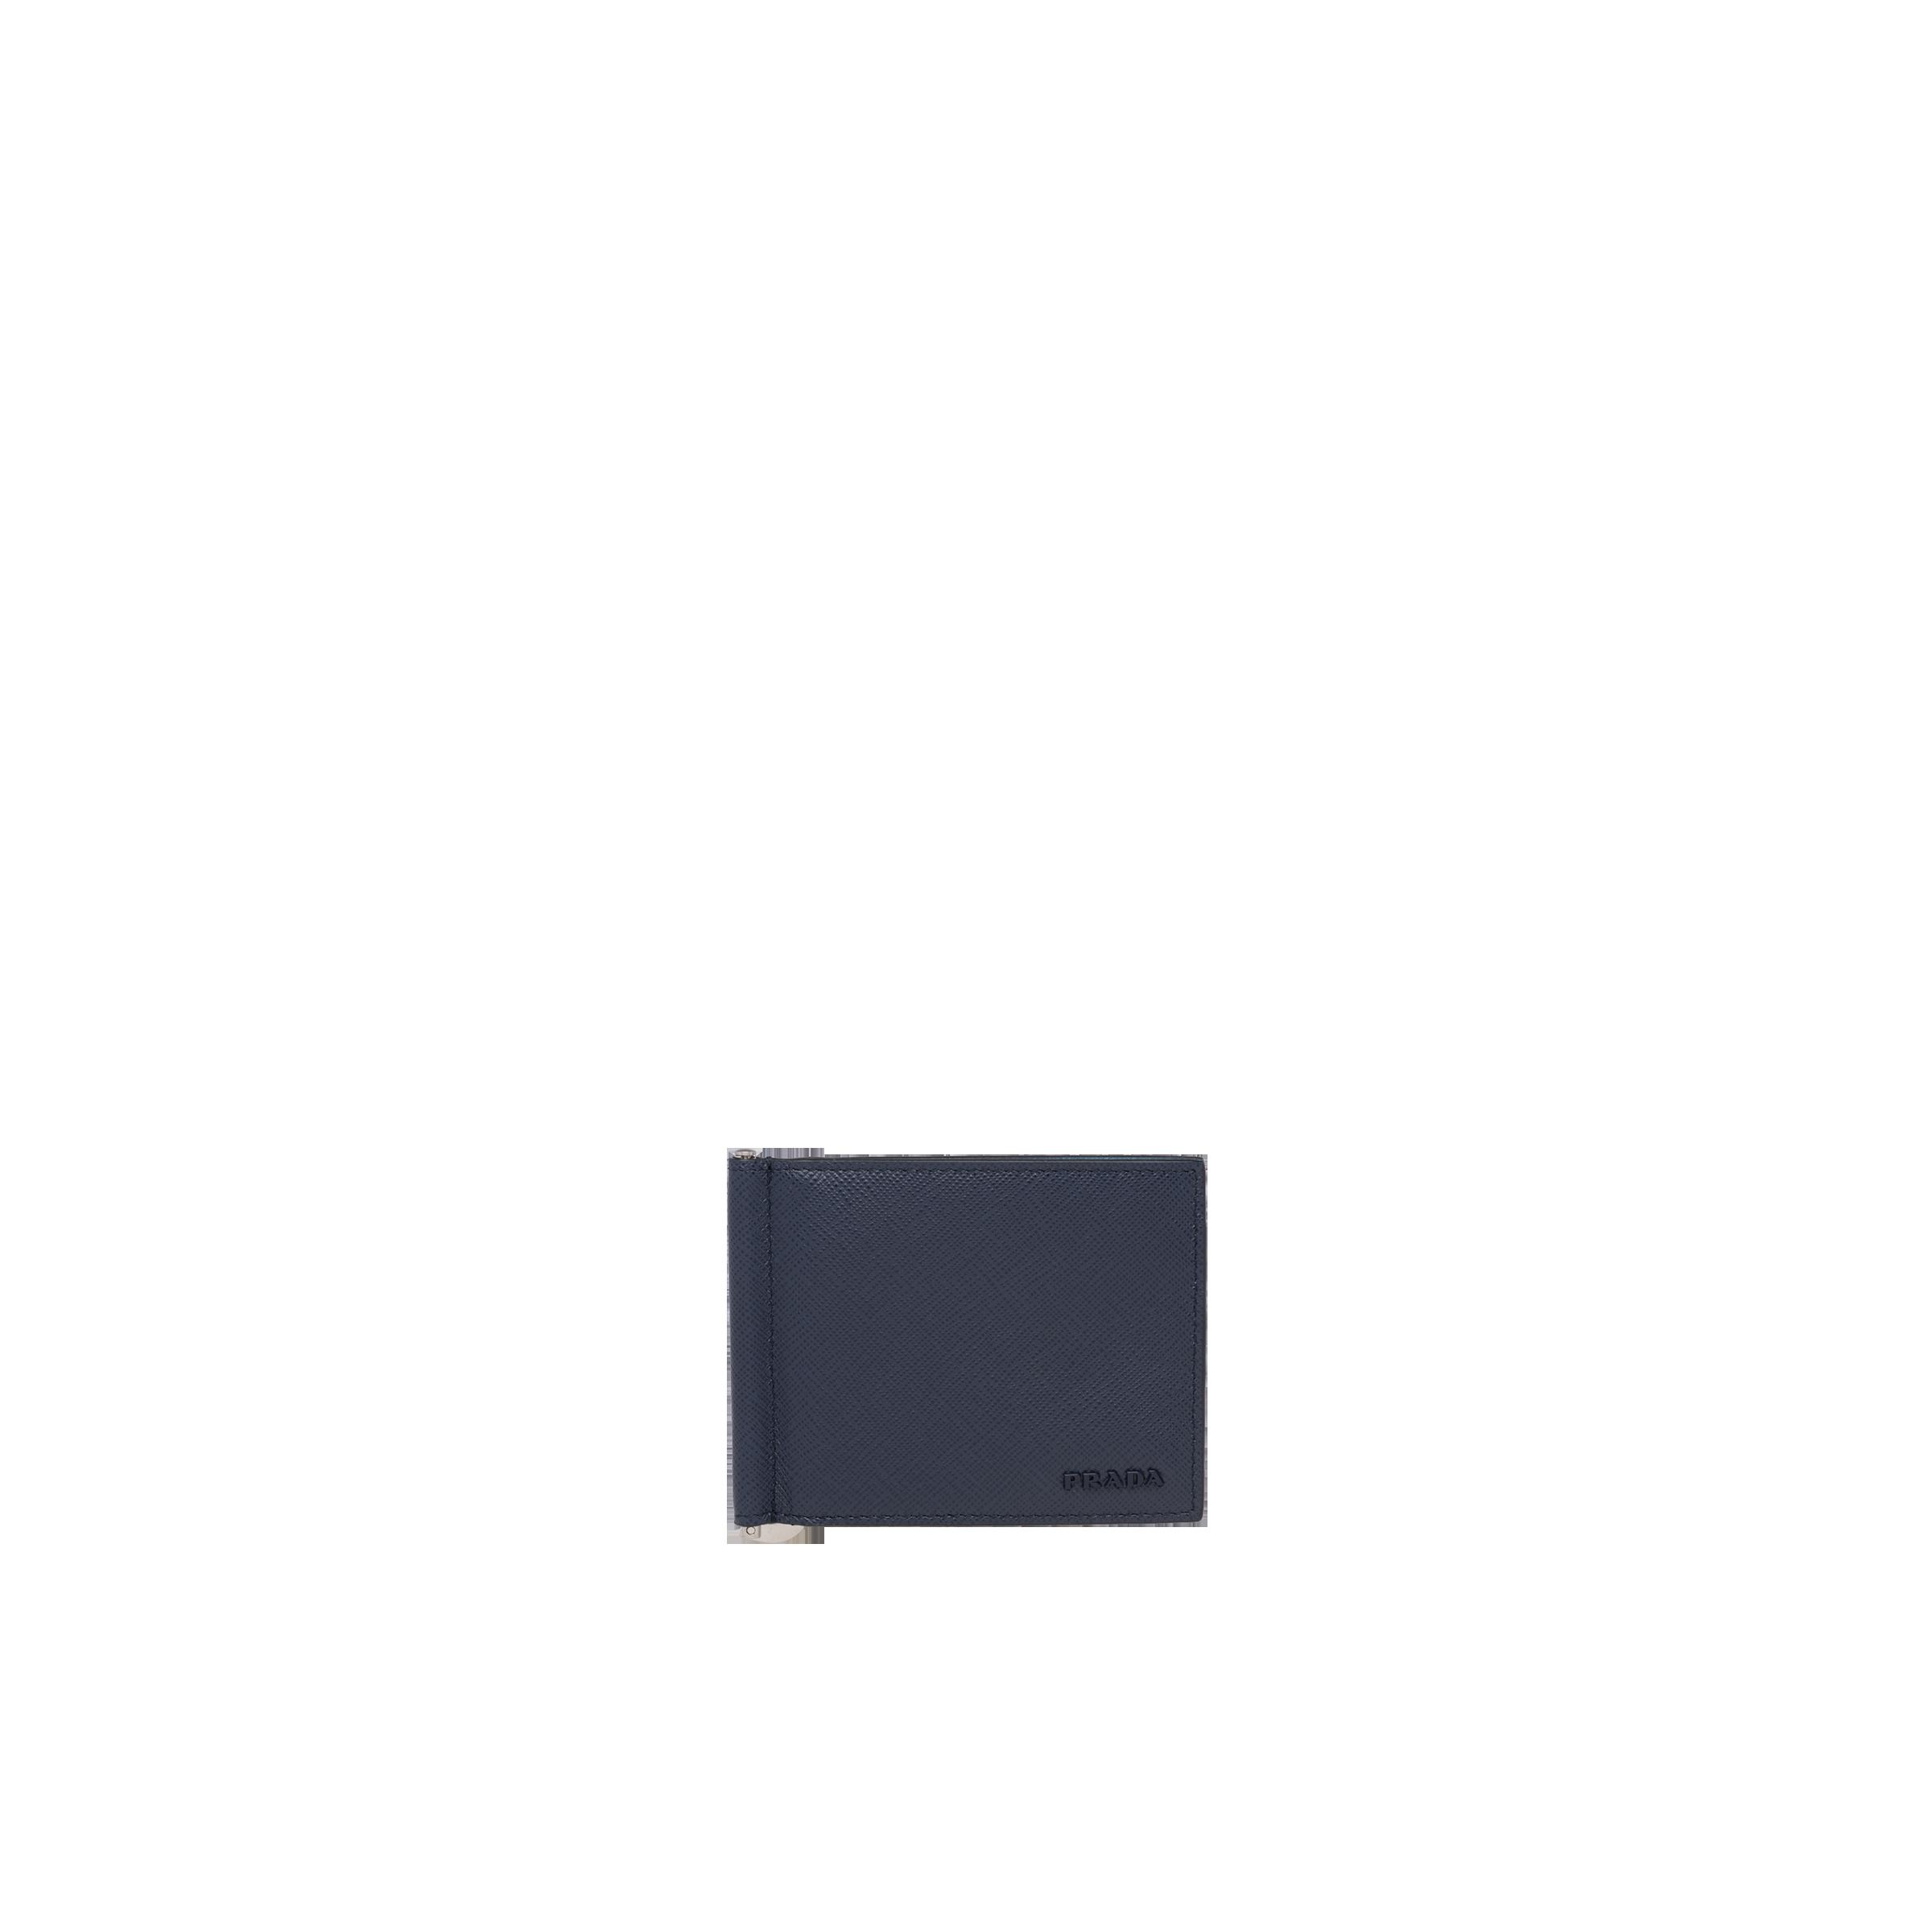 2eaa59fcc7df 2MN077_ZLP_F0216_SLF.png